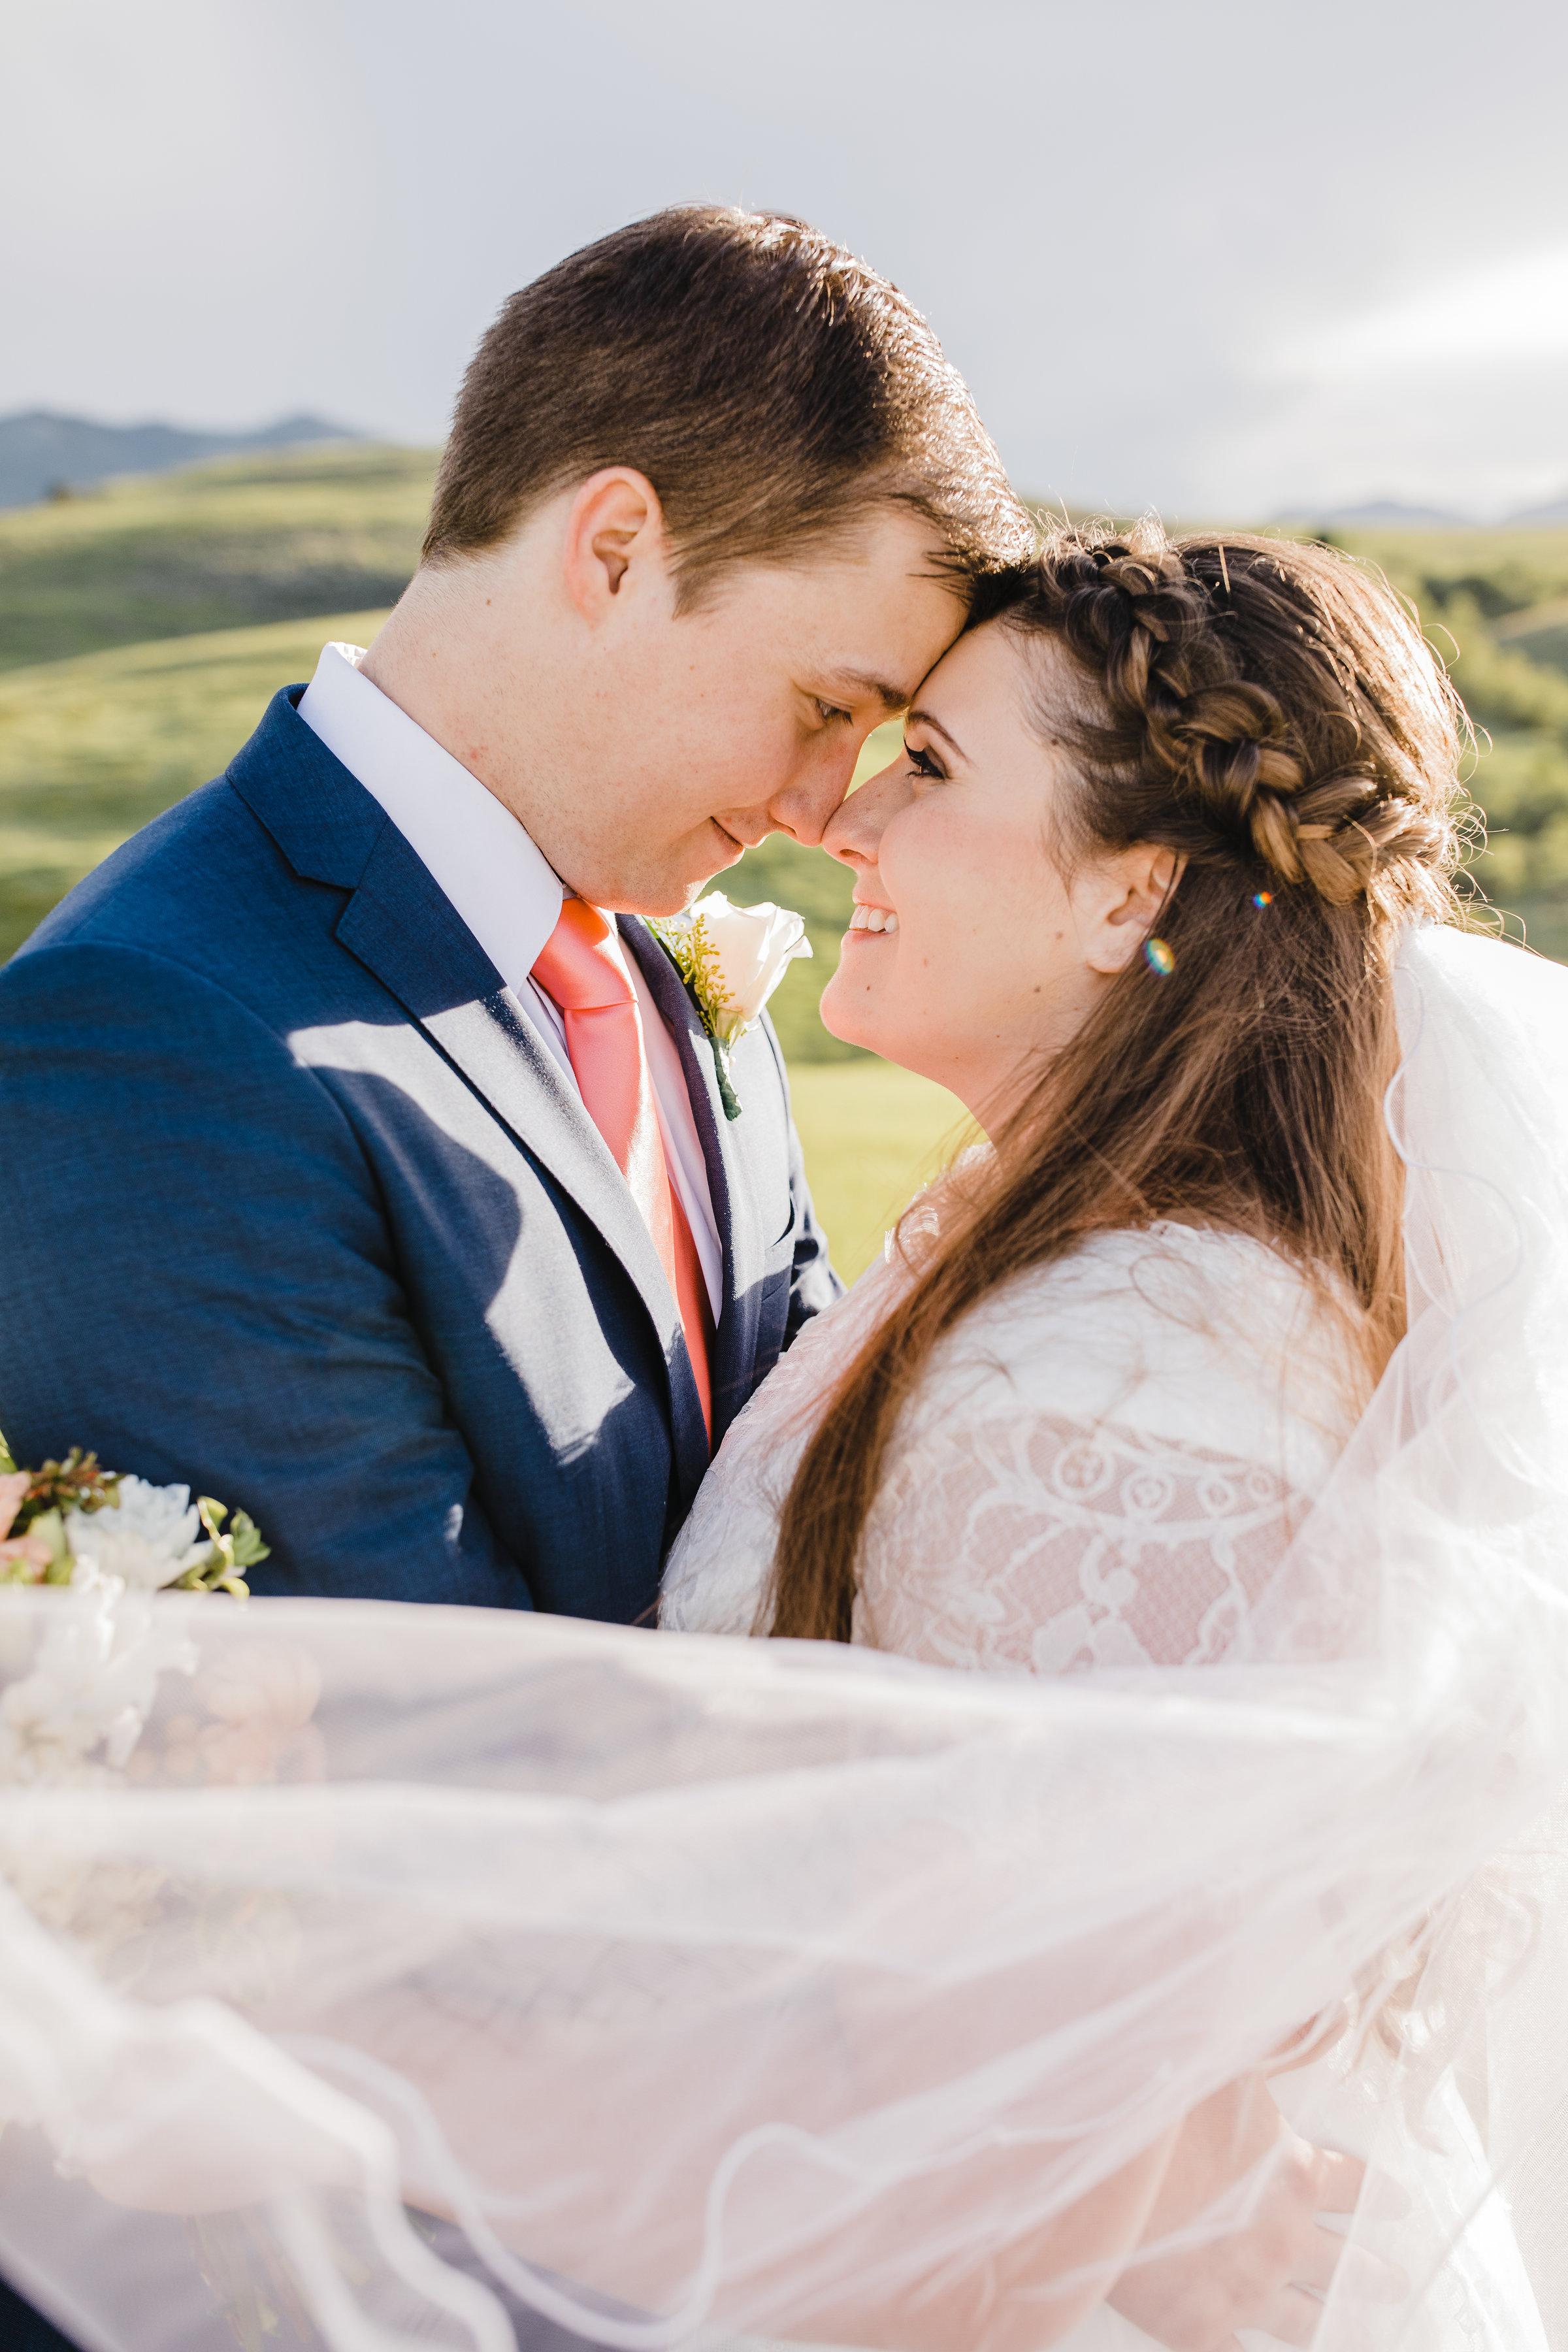 wedding photographer in westminister colorado bridal veil wedding braids outdoor bridals